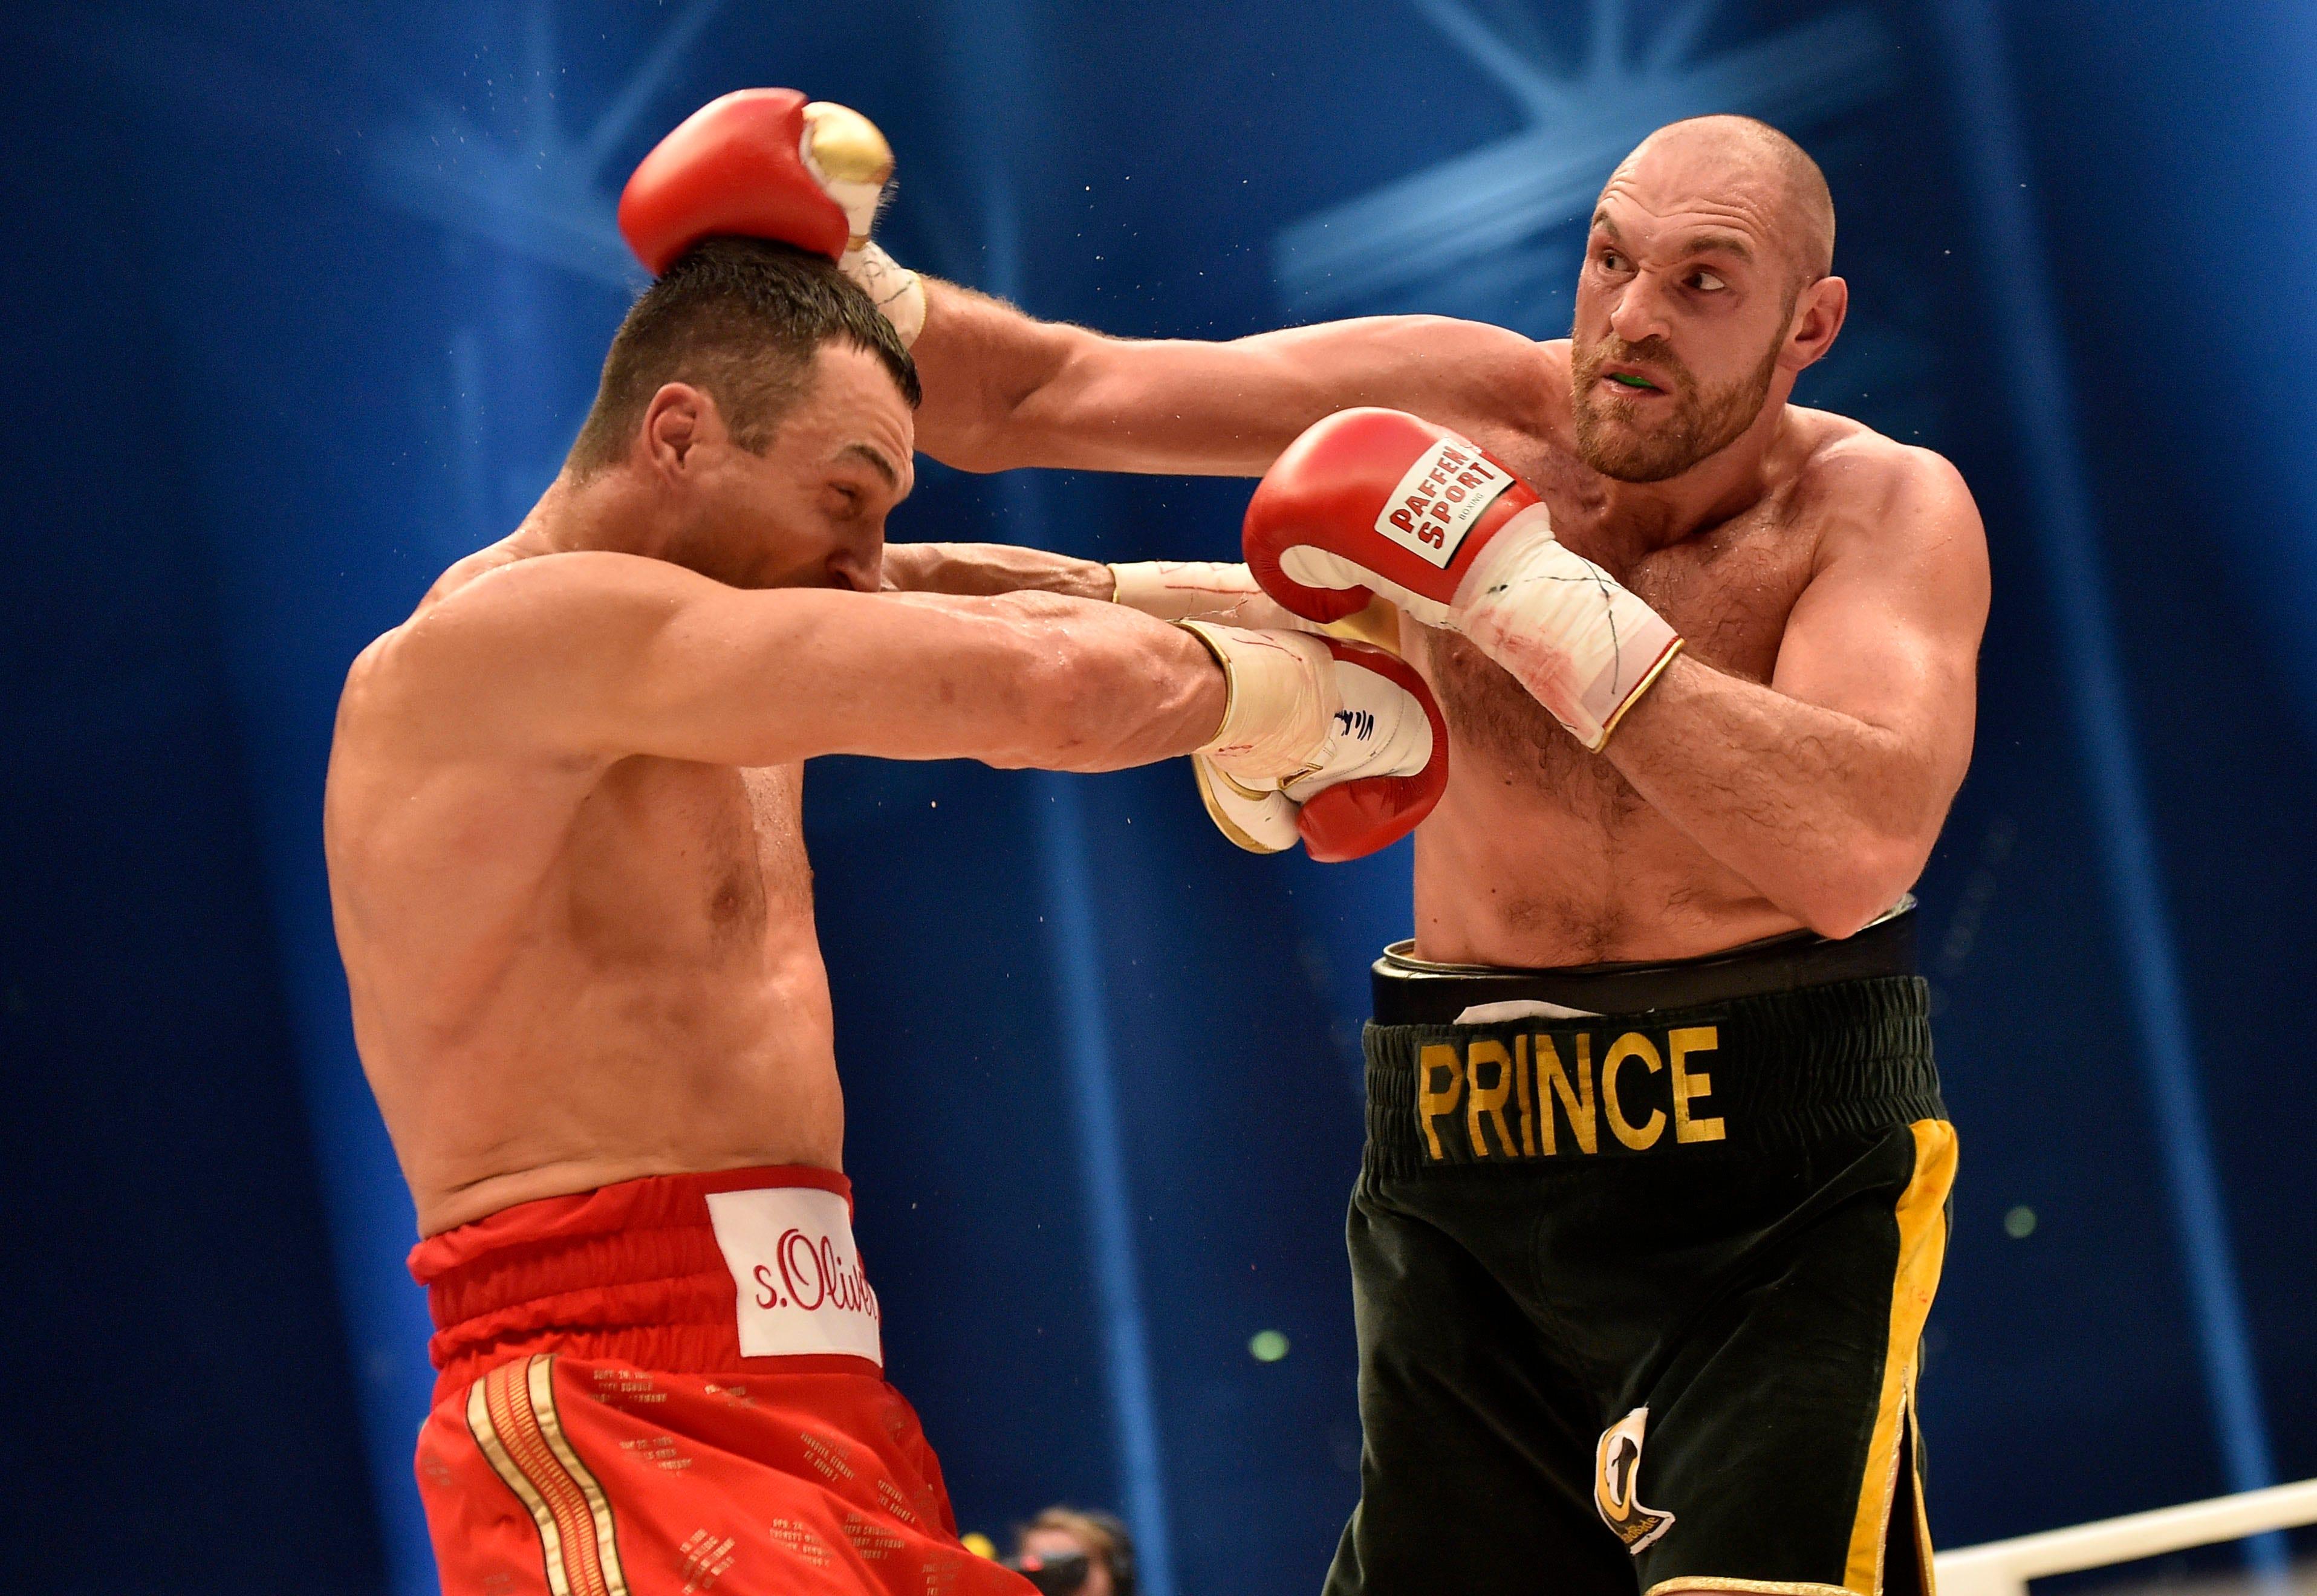 Tyson Fury lost his IBF champion title 09.12.2015 45